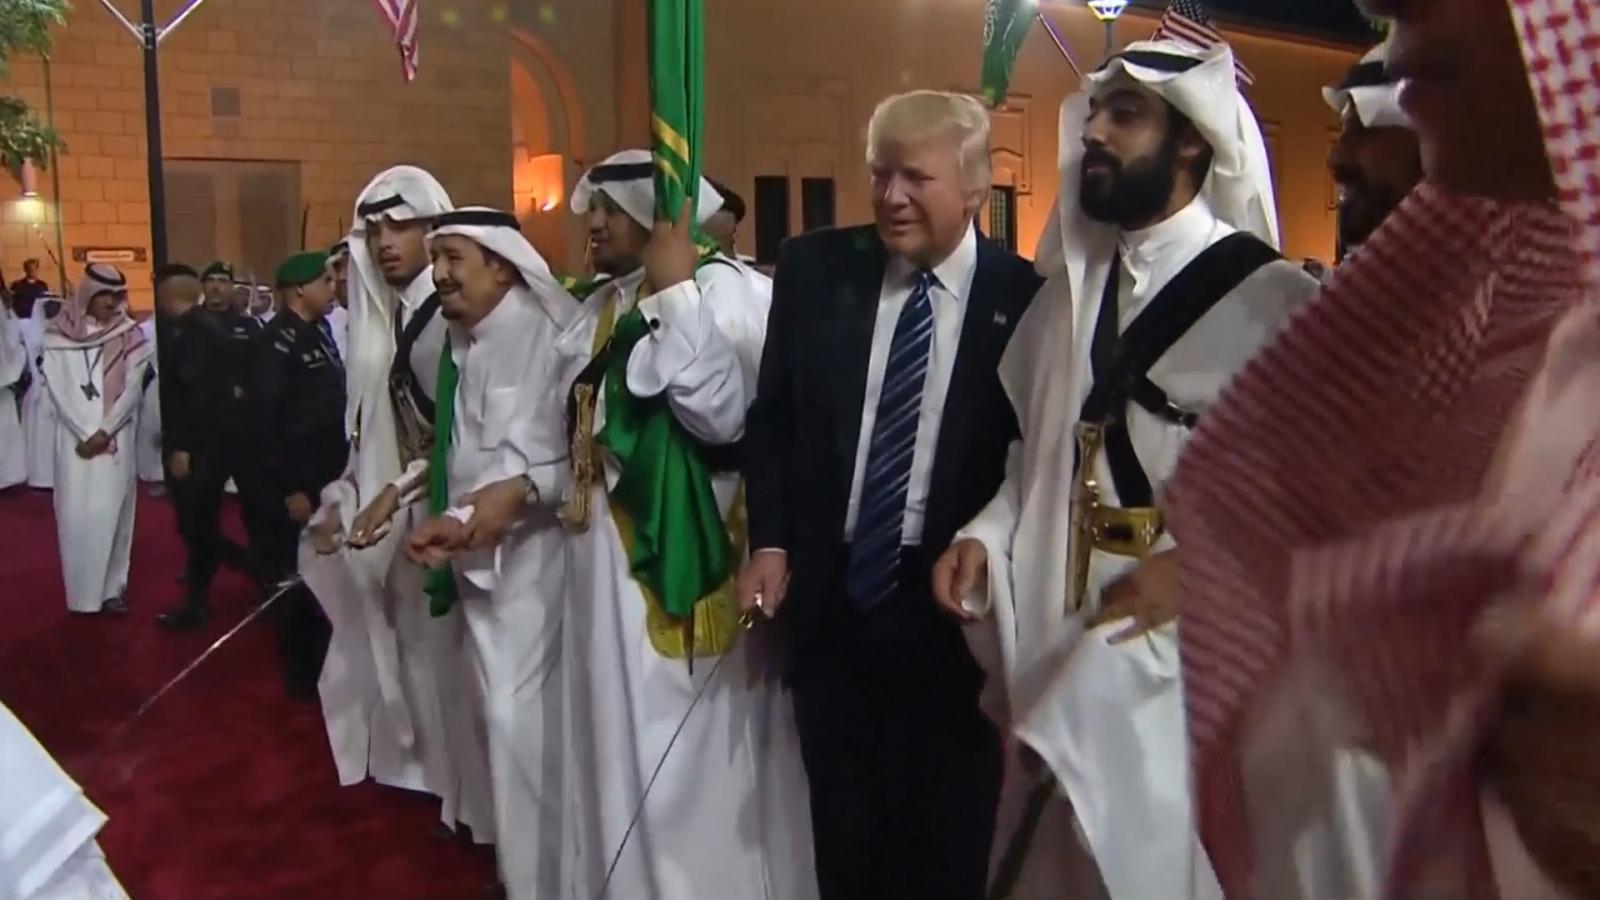 watch-donald-trump-participate-in-traditional-saudi-sword-dance